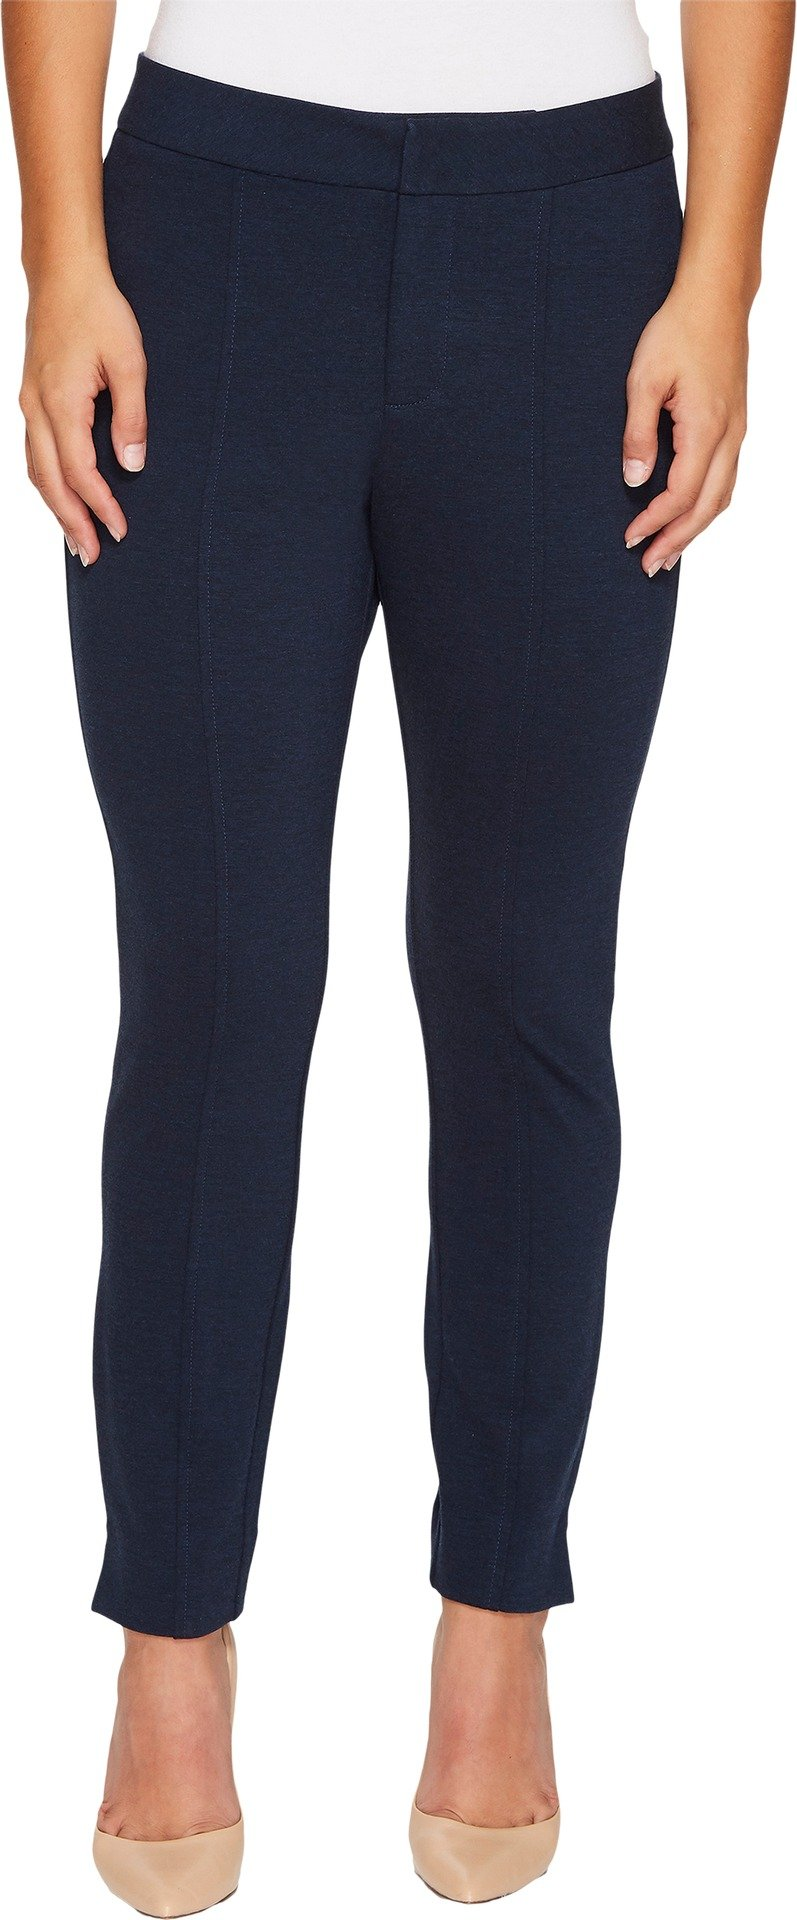 NYDJ Women's Petite Size Ponte Knit Ankle Pants, Peacoat Heather, 10P